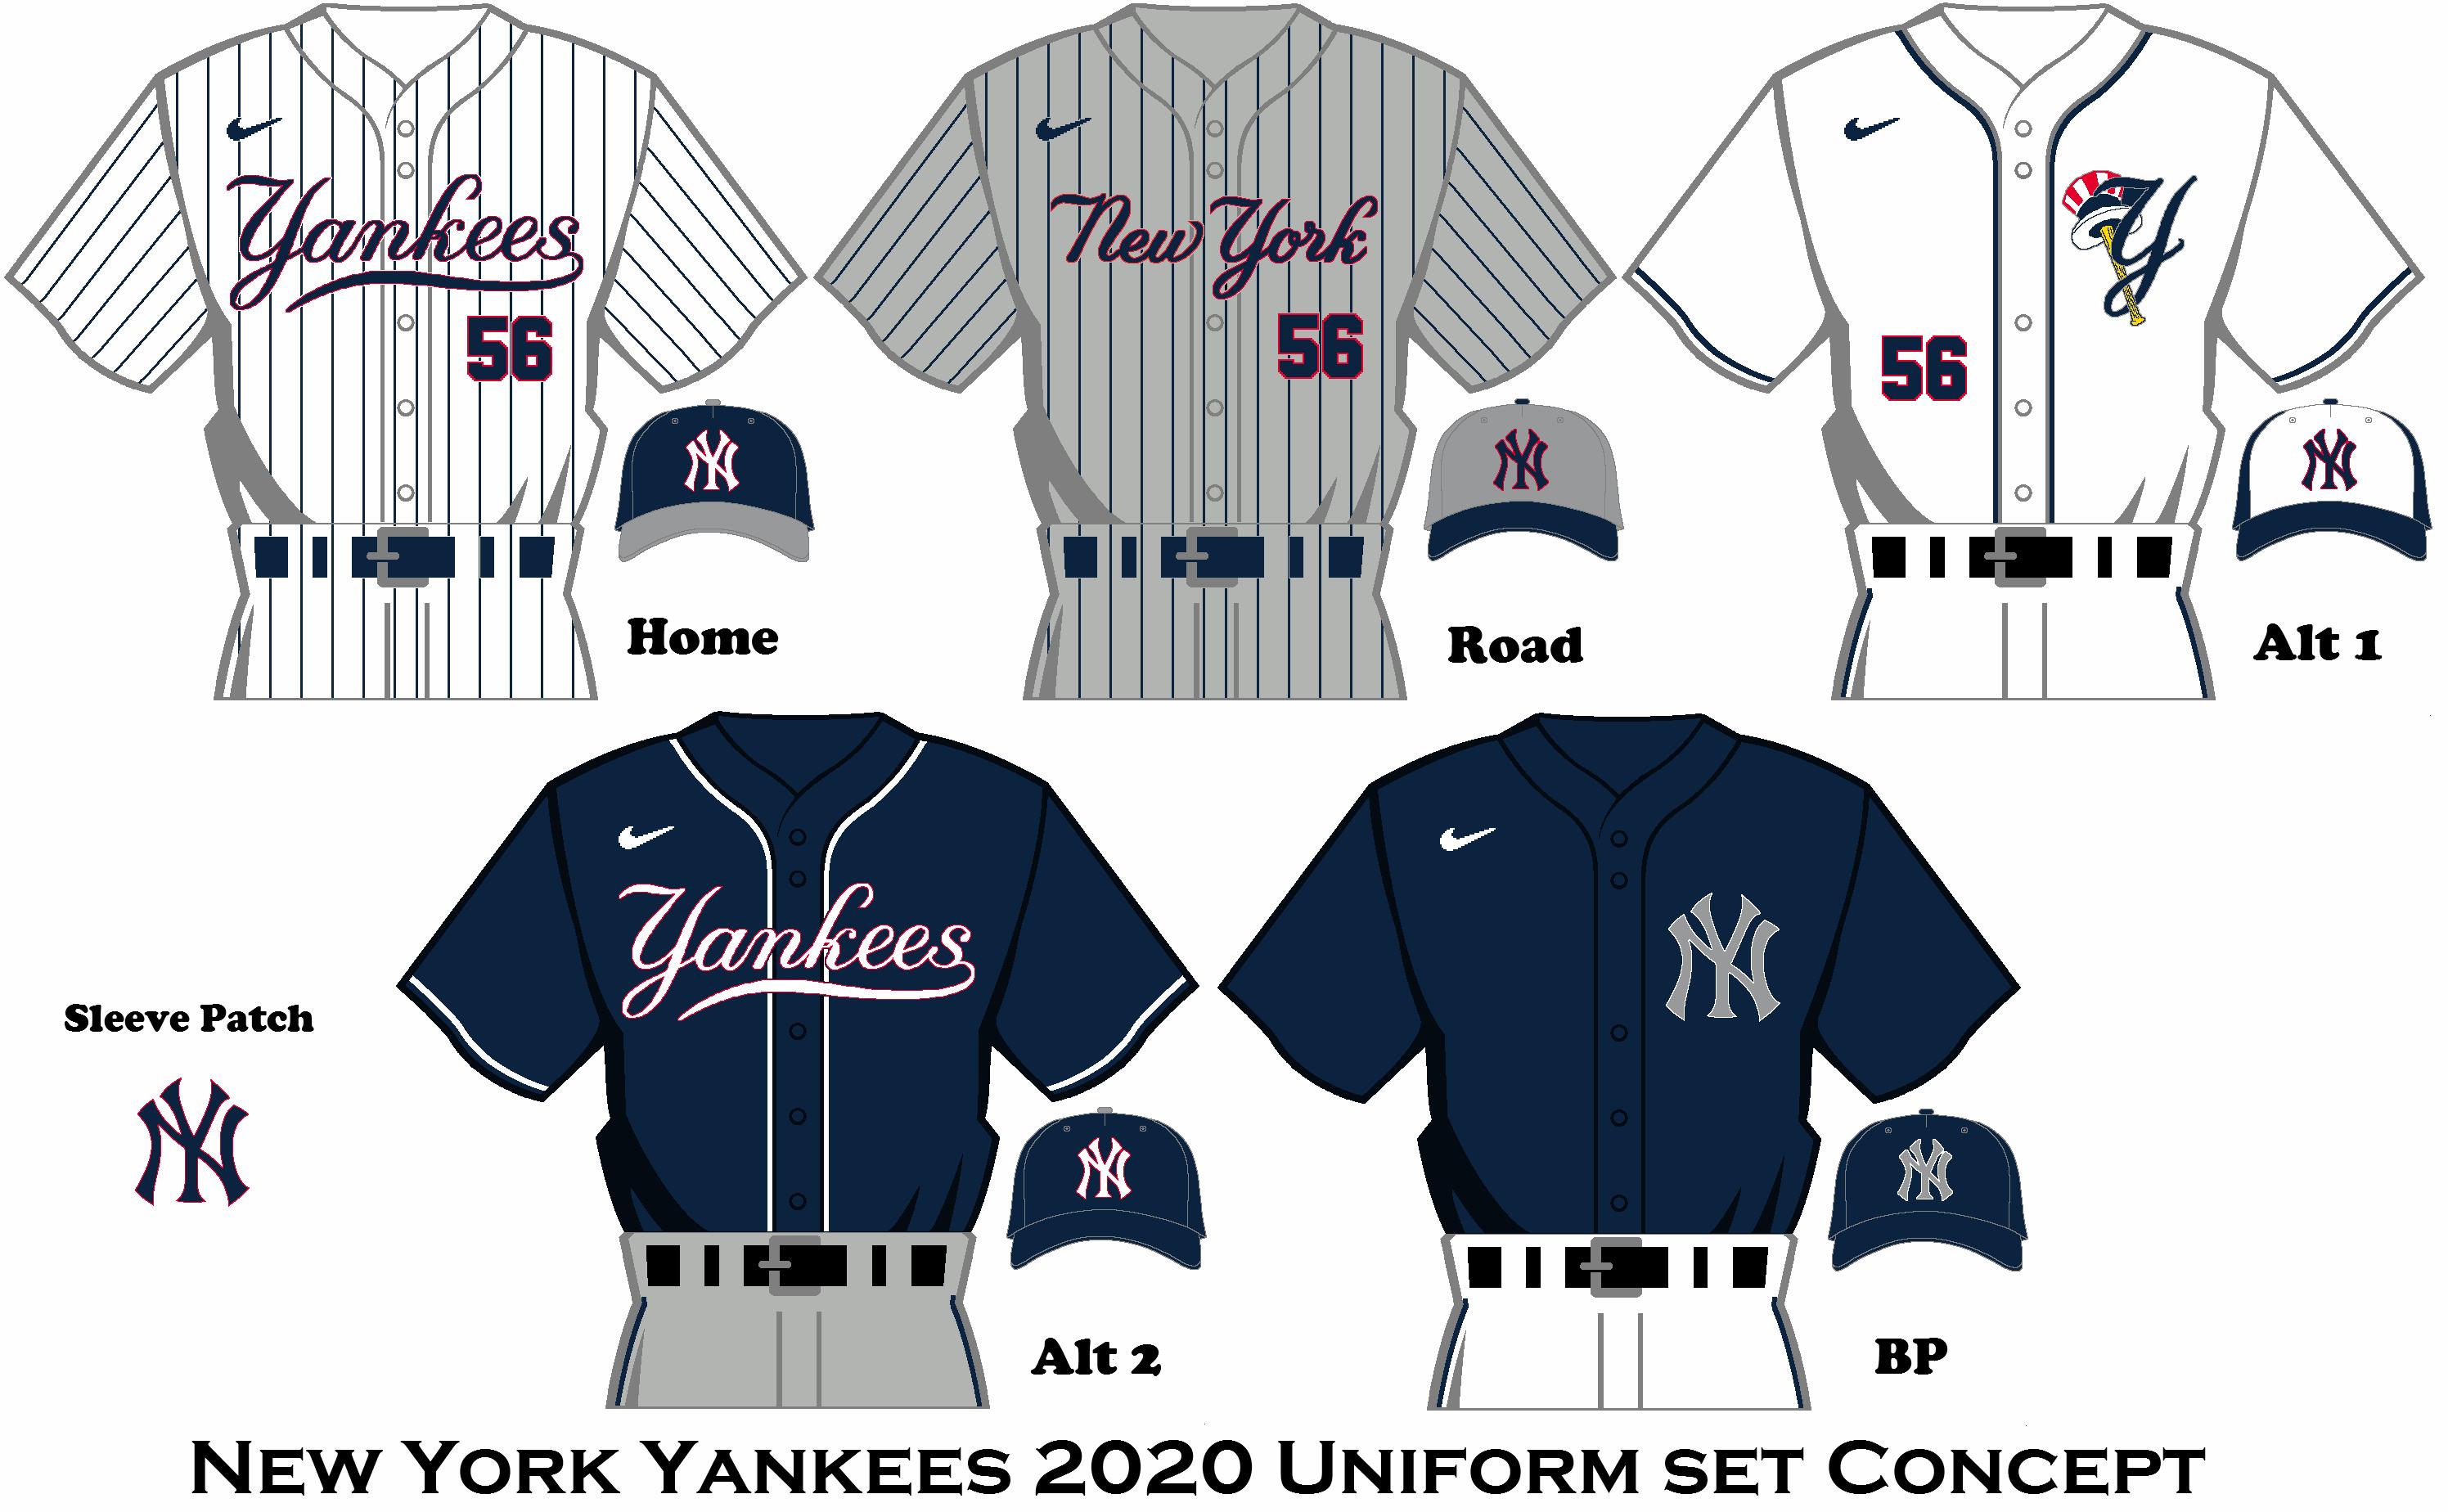 2020 Nike Rebrand New York Yankees Uniform Set New York Yankees Yankees Yankees Fan